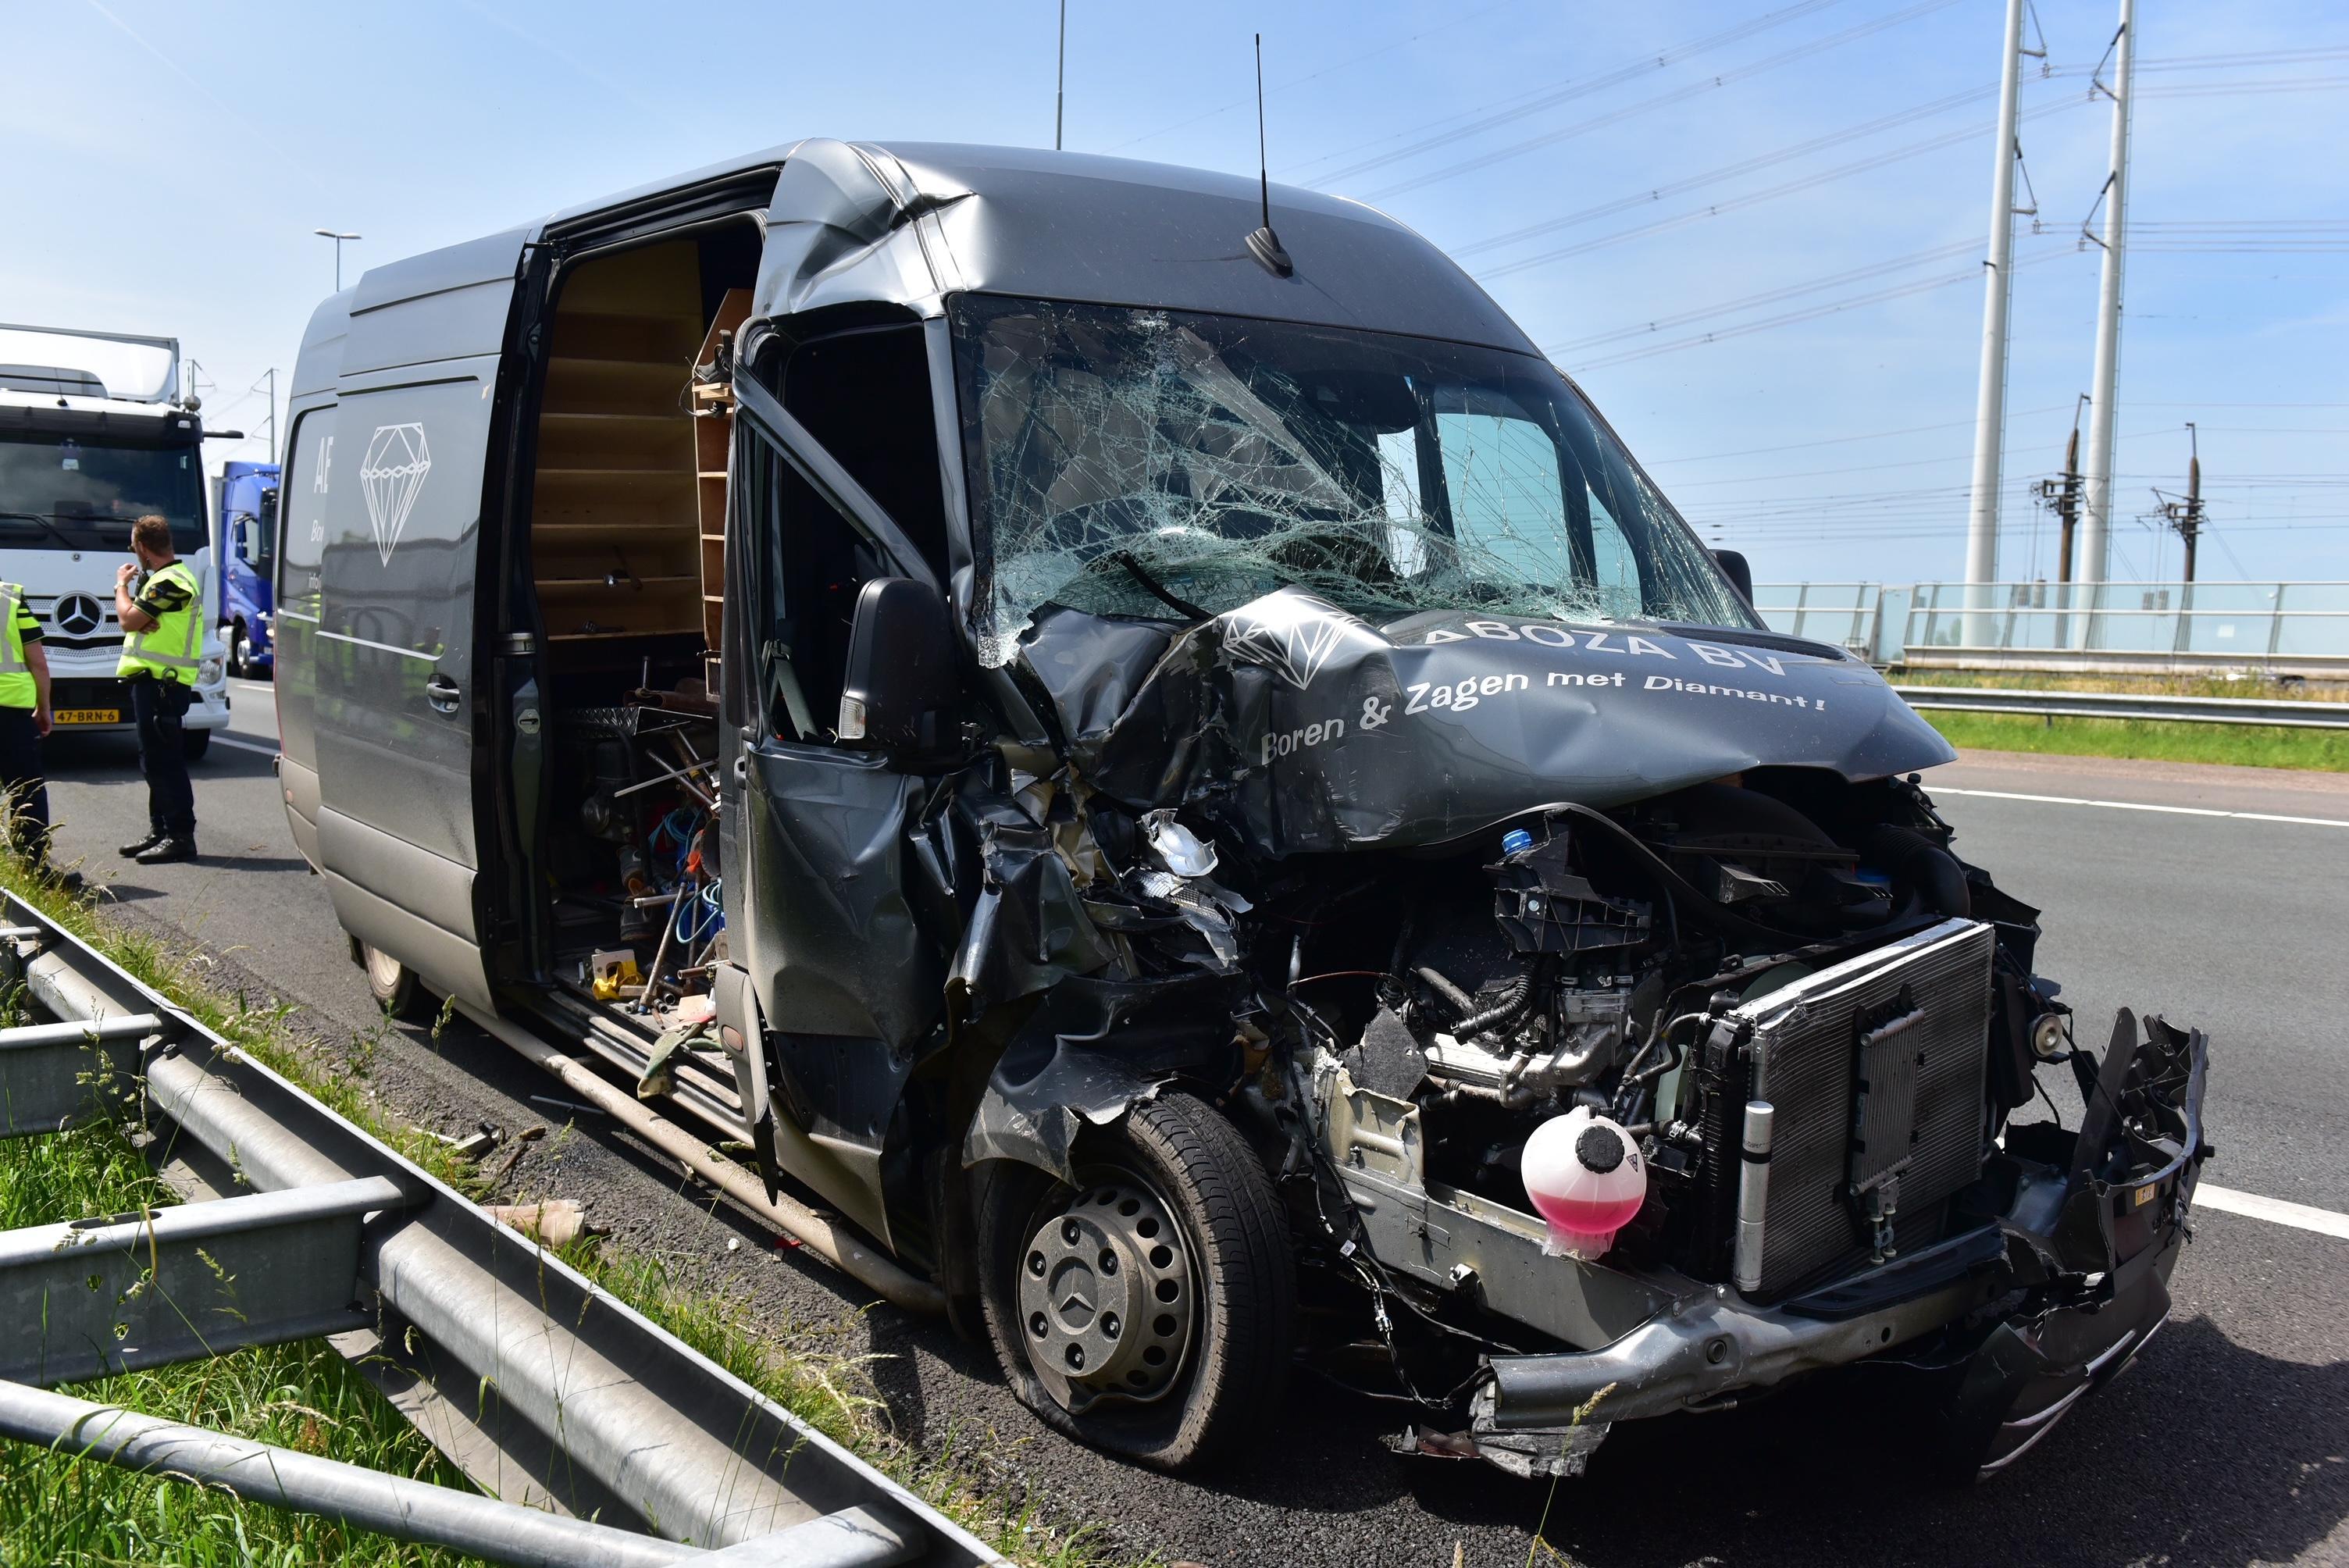 Bedrijfsbusje botst tegen vrachtwagen op A4 bij Rijpwetering: file van 3 kilometer